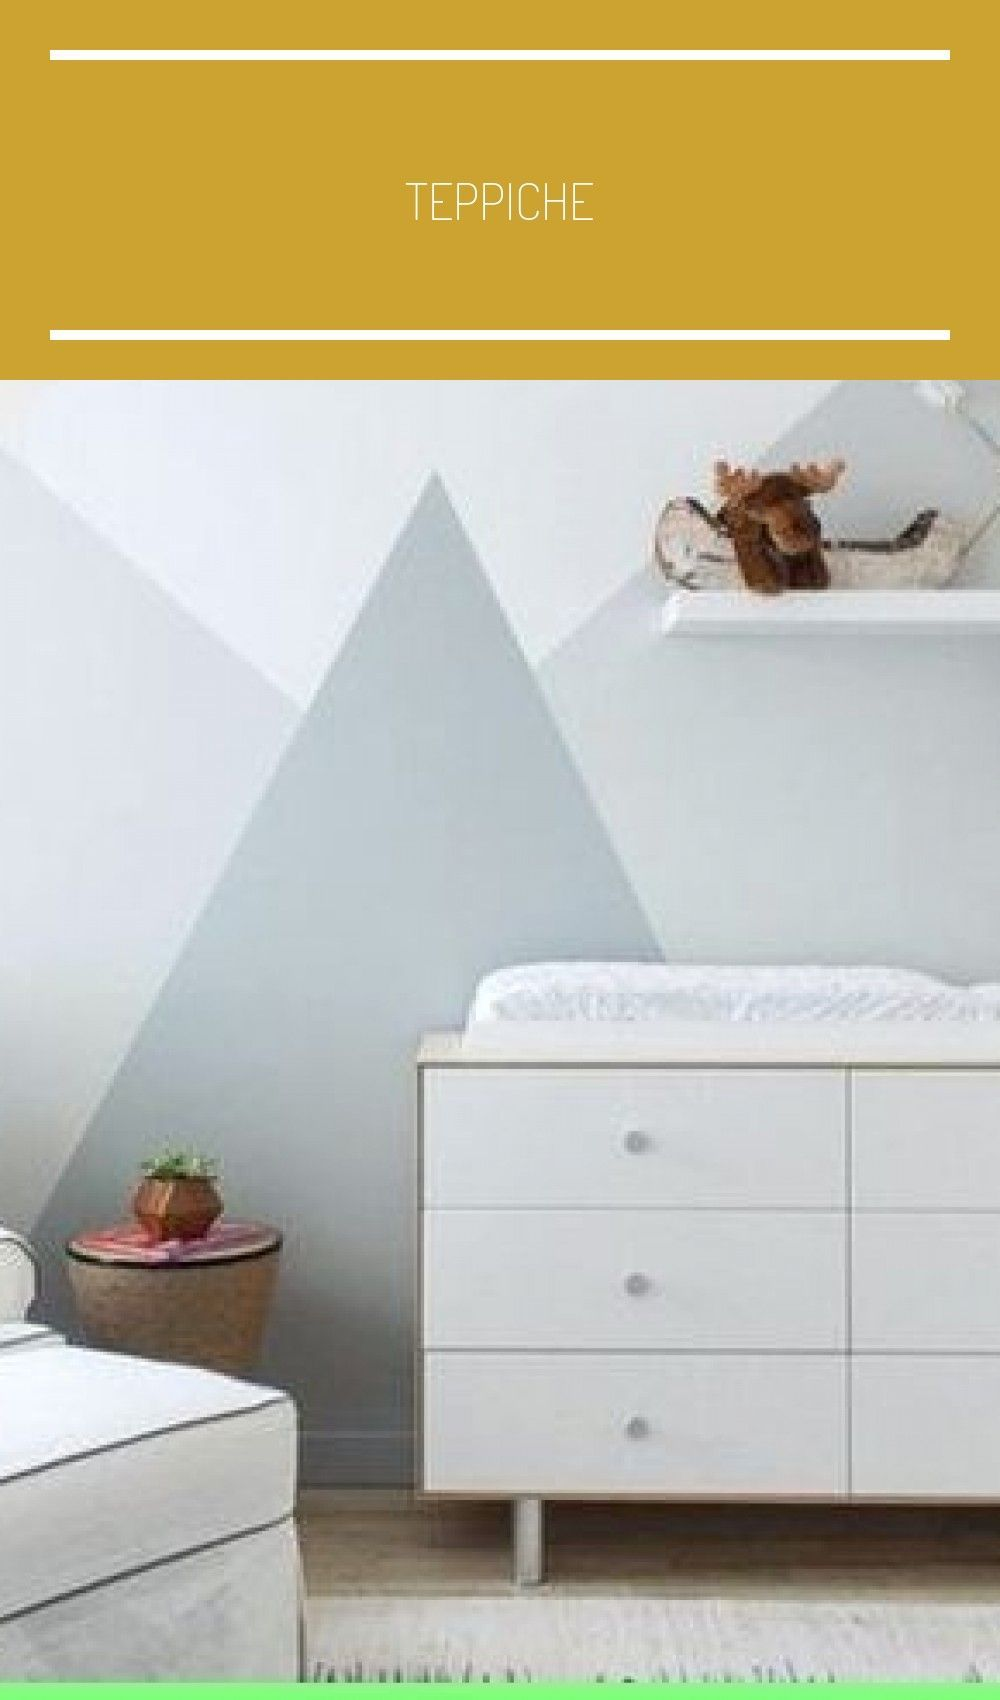 Full Size of Baby Kinderzimmer Junge Wandgestaltung Mit Farbe Regale Regal Weiß Sofa Wohnzimmer Wandgestaltung Kinderzimmer Jungen